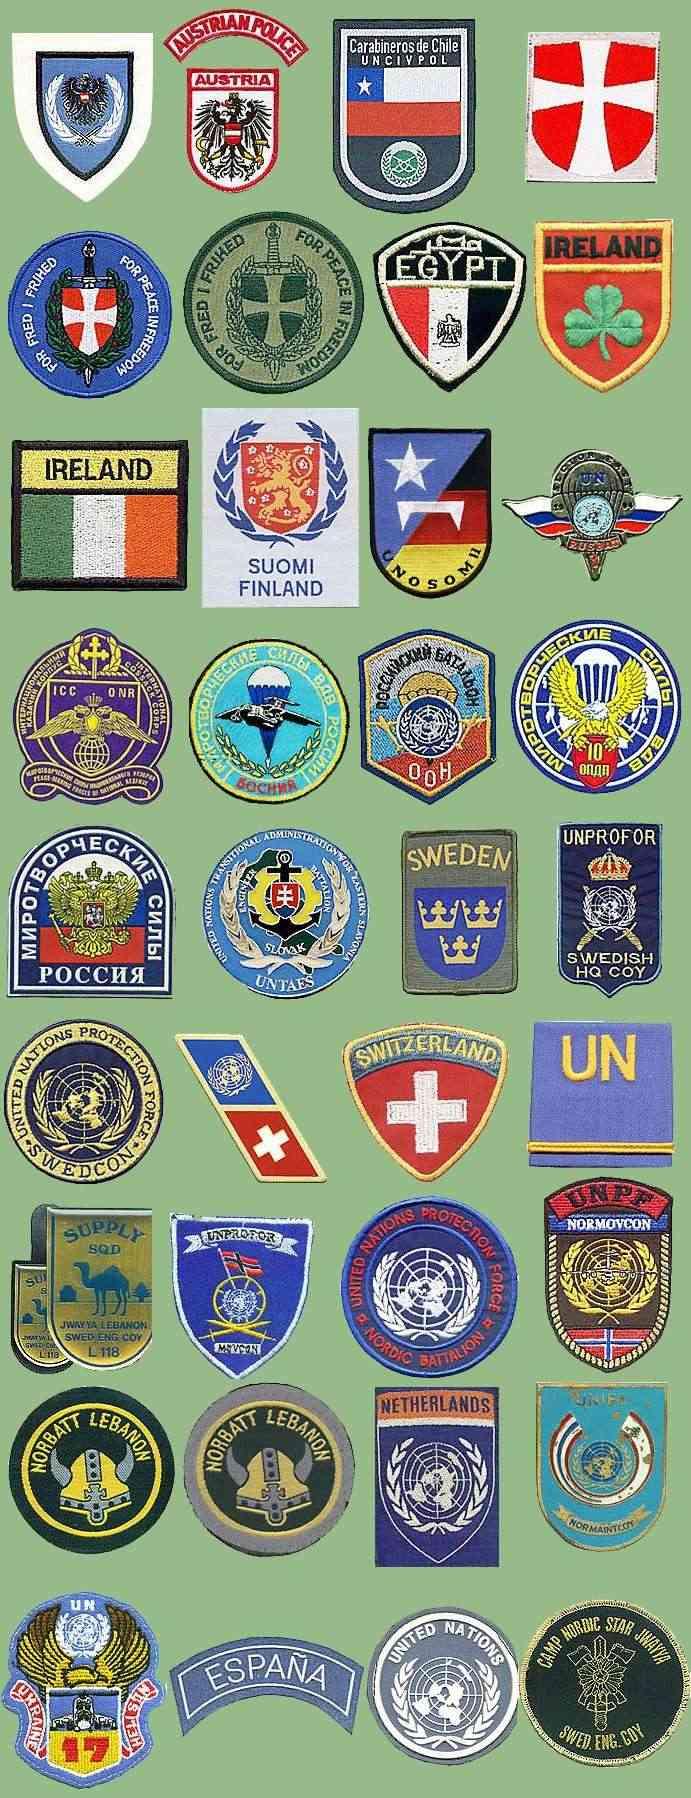 UN insignias from my collection Un-nac10